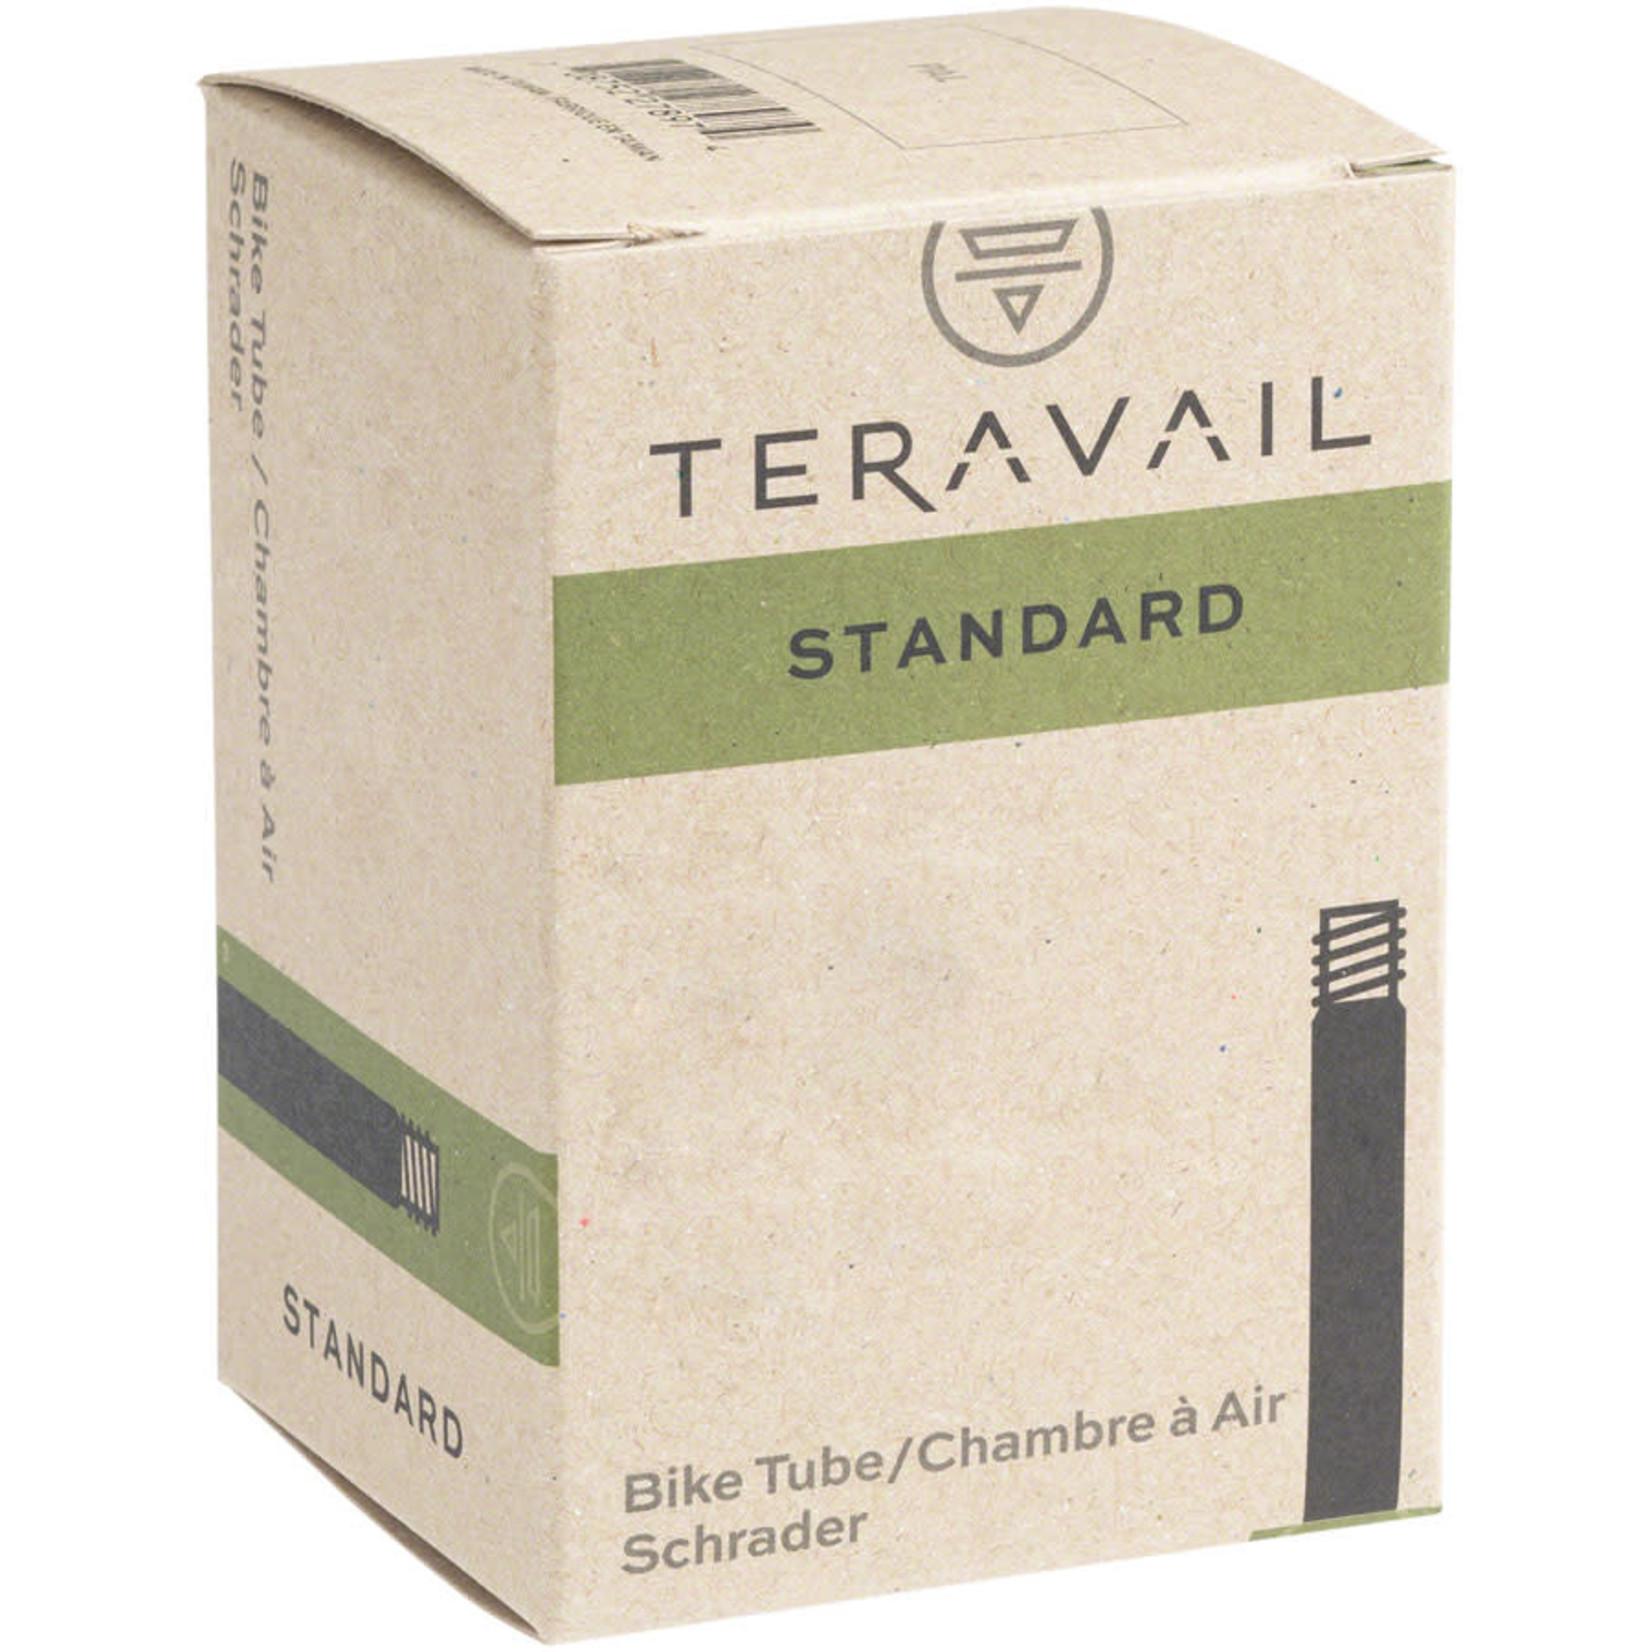 "Q-Tubes Q-Tubes / Teravail 24"" x 1.5-1.75"" Schrader Valve Tube 150g *Low Lead Valve*"